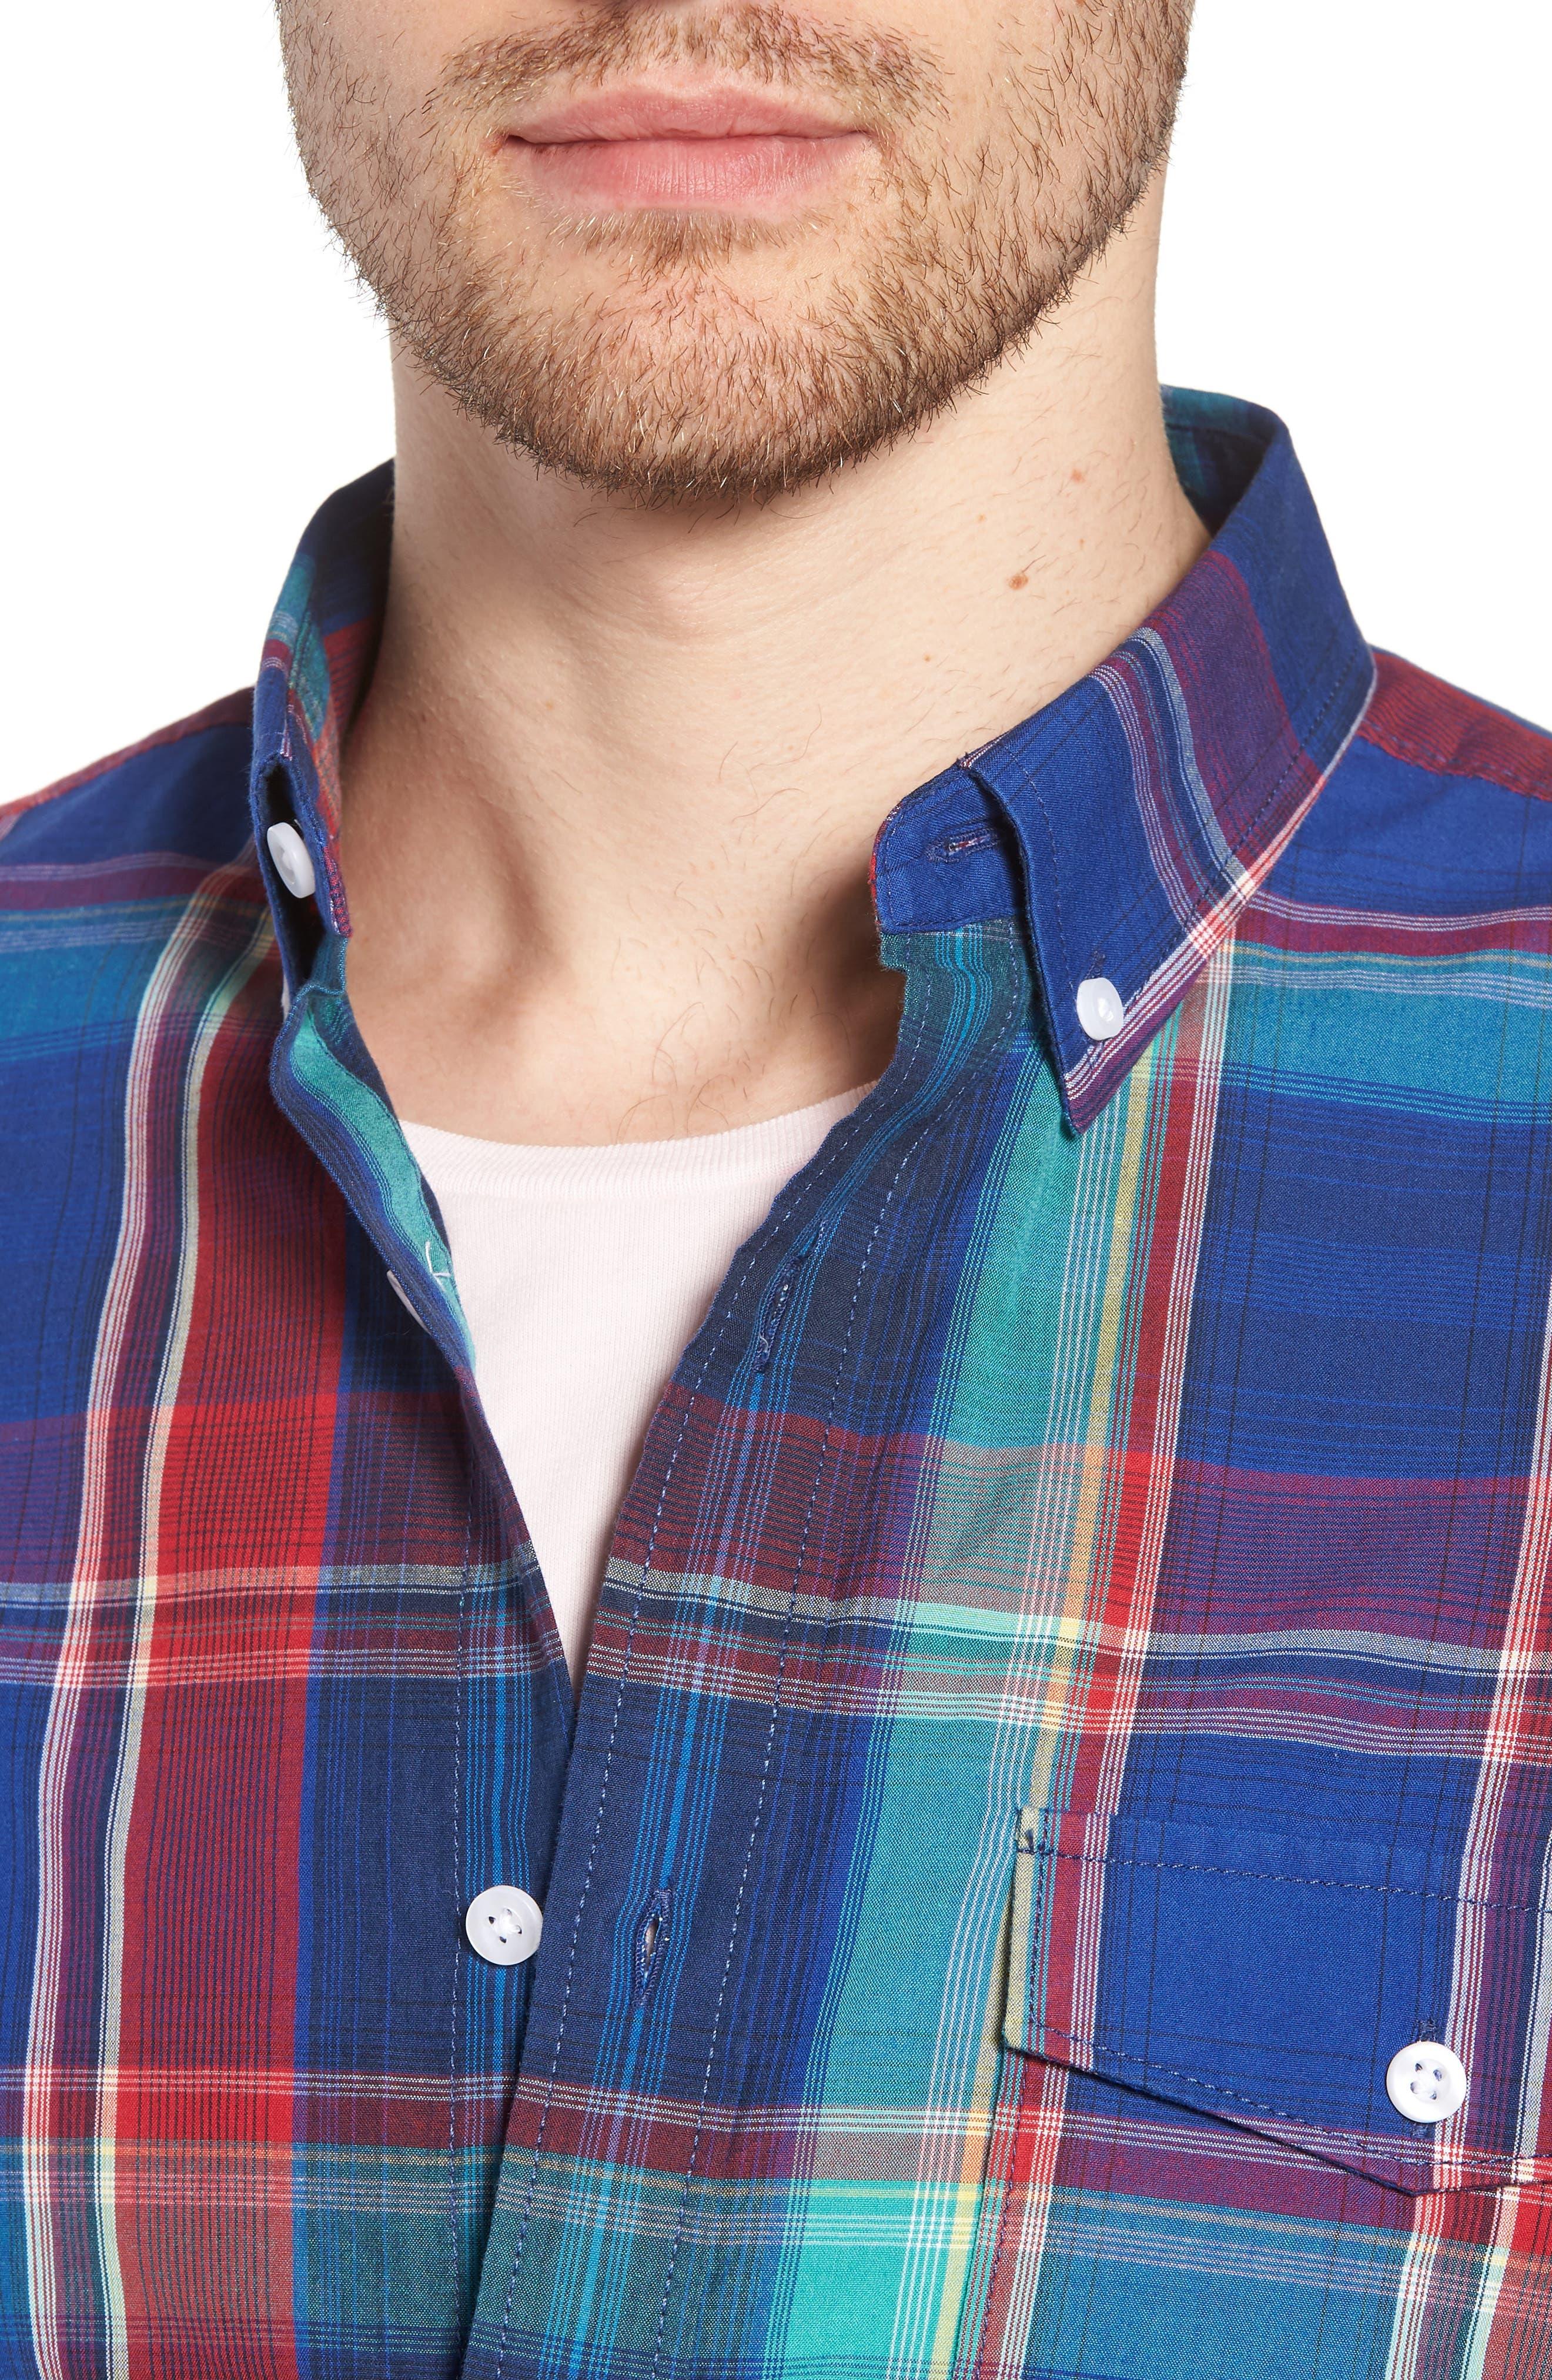 Ivy Trim Fit Madras Plaid Sport Shirt,                             Alternate thumbnail 2, color,                             Navy Red Fine Line Plaid